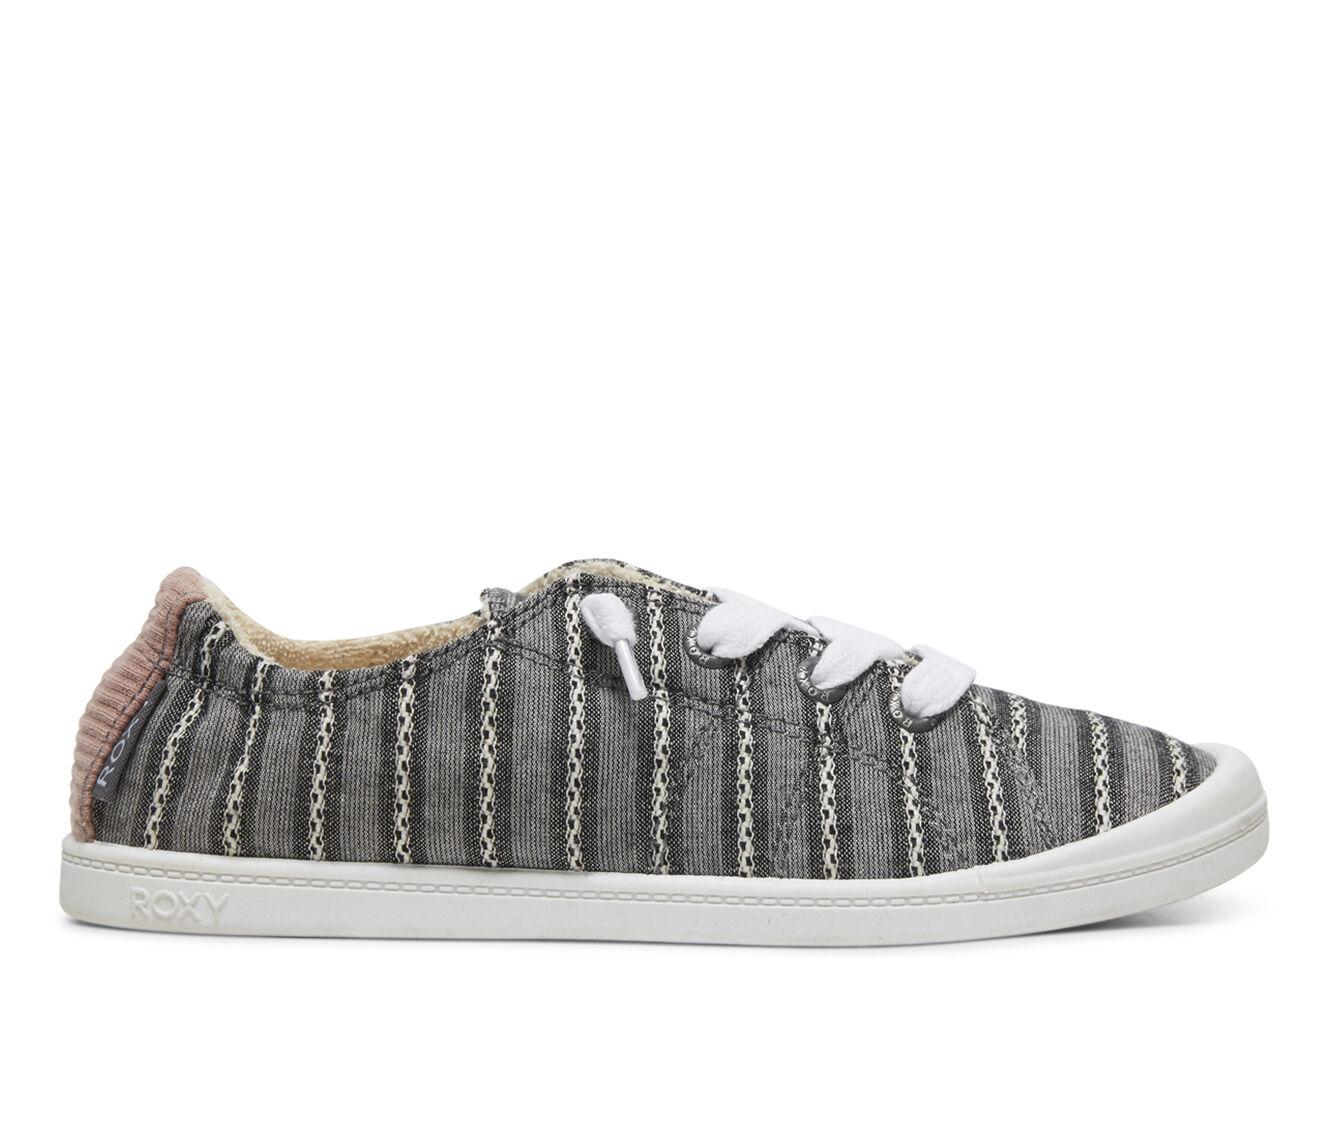 Buying New Women's Roxy Bayshore Sneakers Black Stripe